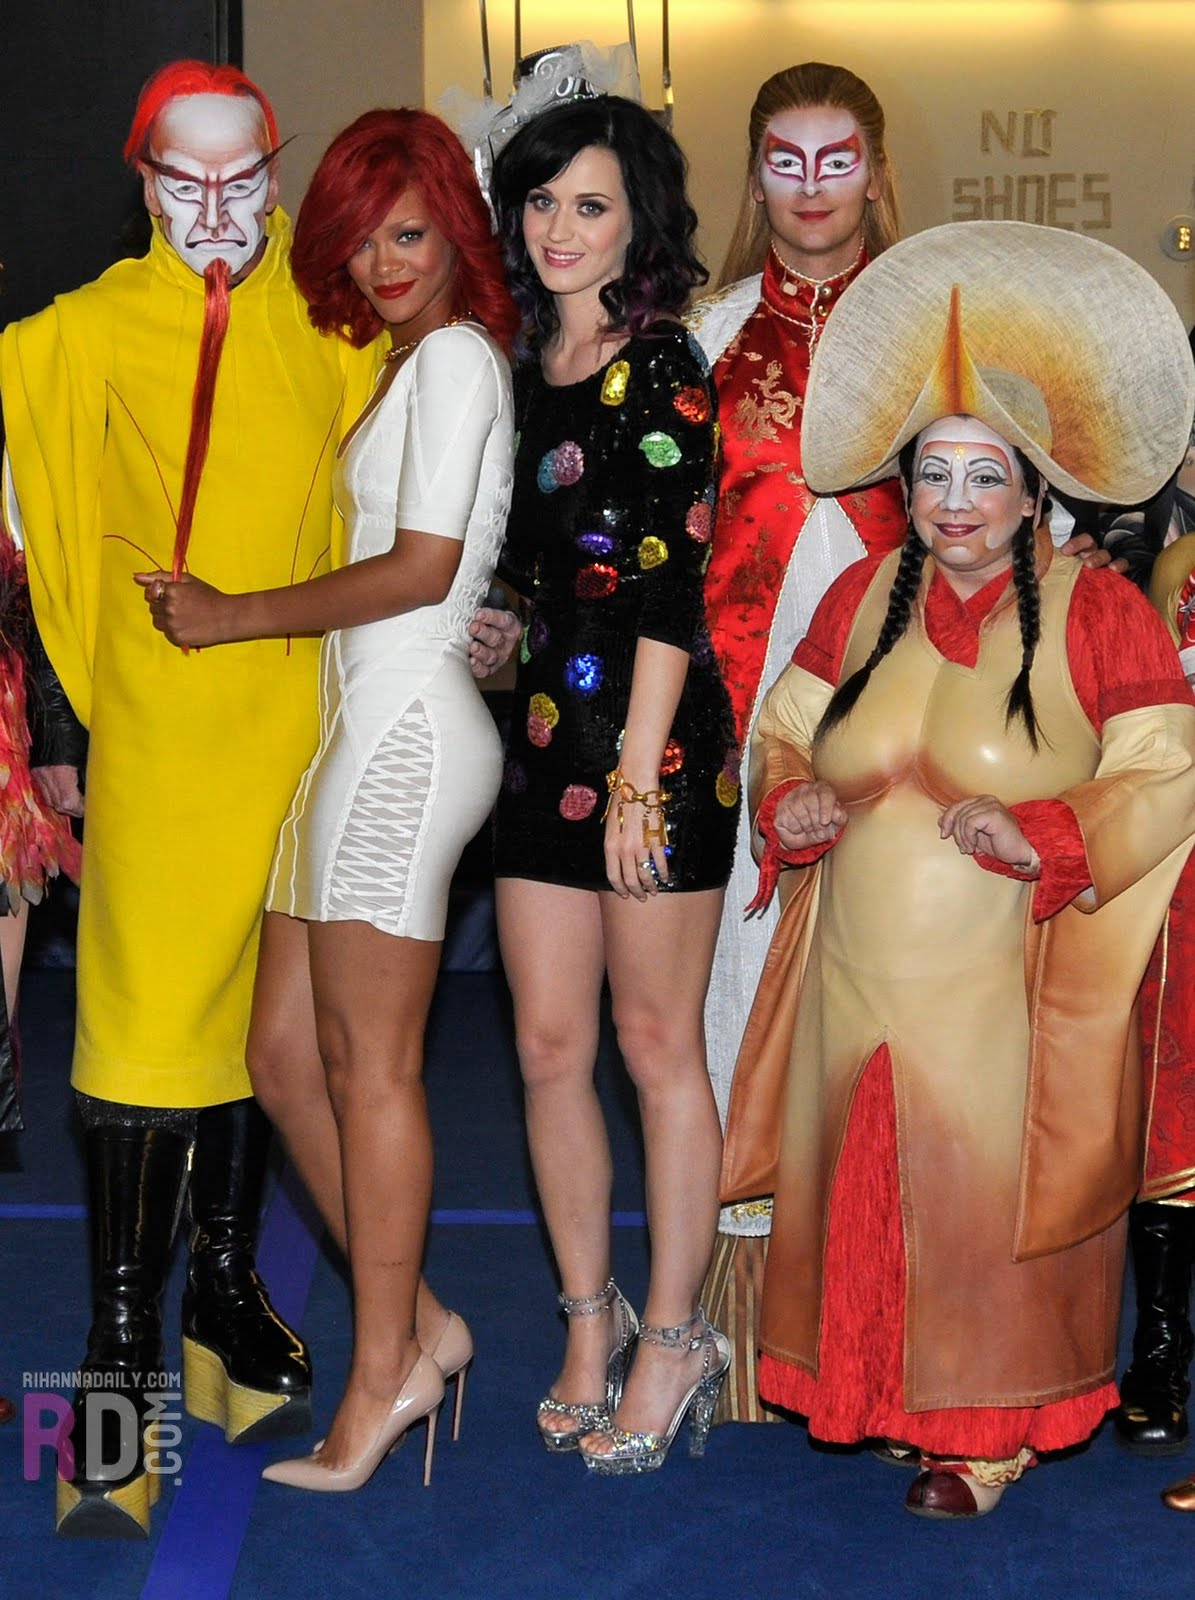 http://2.bp.blogspot.com/_-knQcvB6hEw/TJdQSSmLoYI/AAAAAAAAIyc/TcK7isQNHT4/s1600/Katy+Perry+%26+Rihanna+leggy+%40+MGM+Grand+Hotel+in+Vegas10.jpg